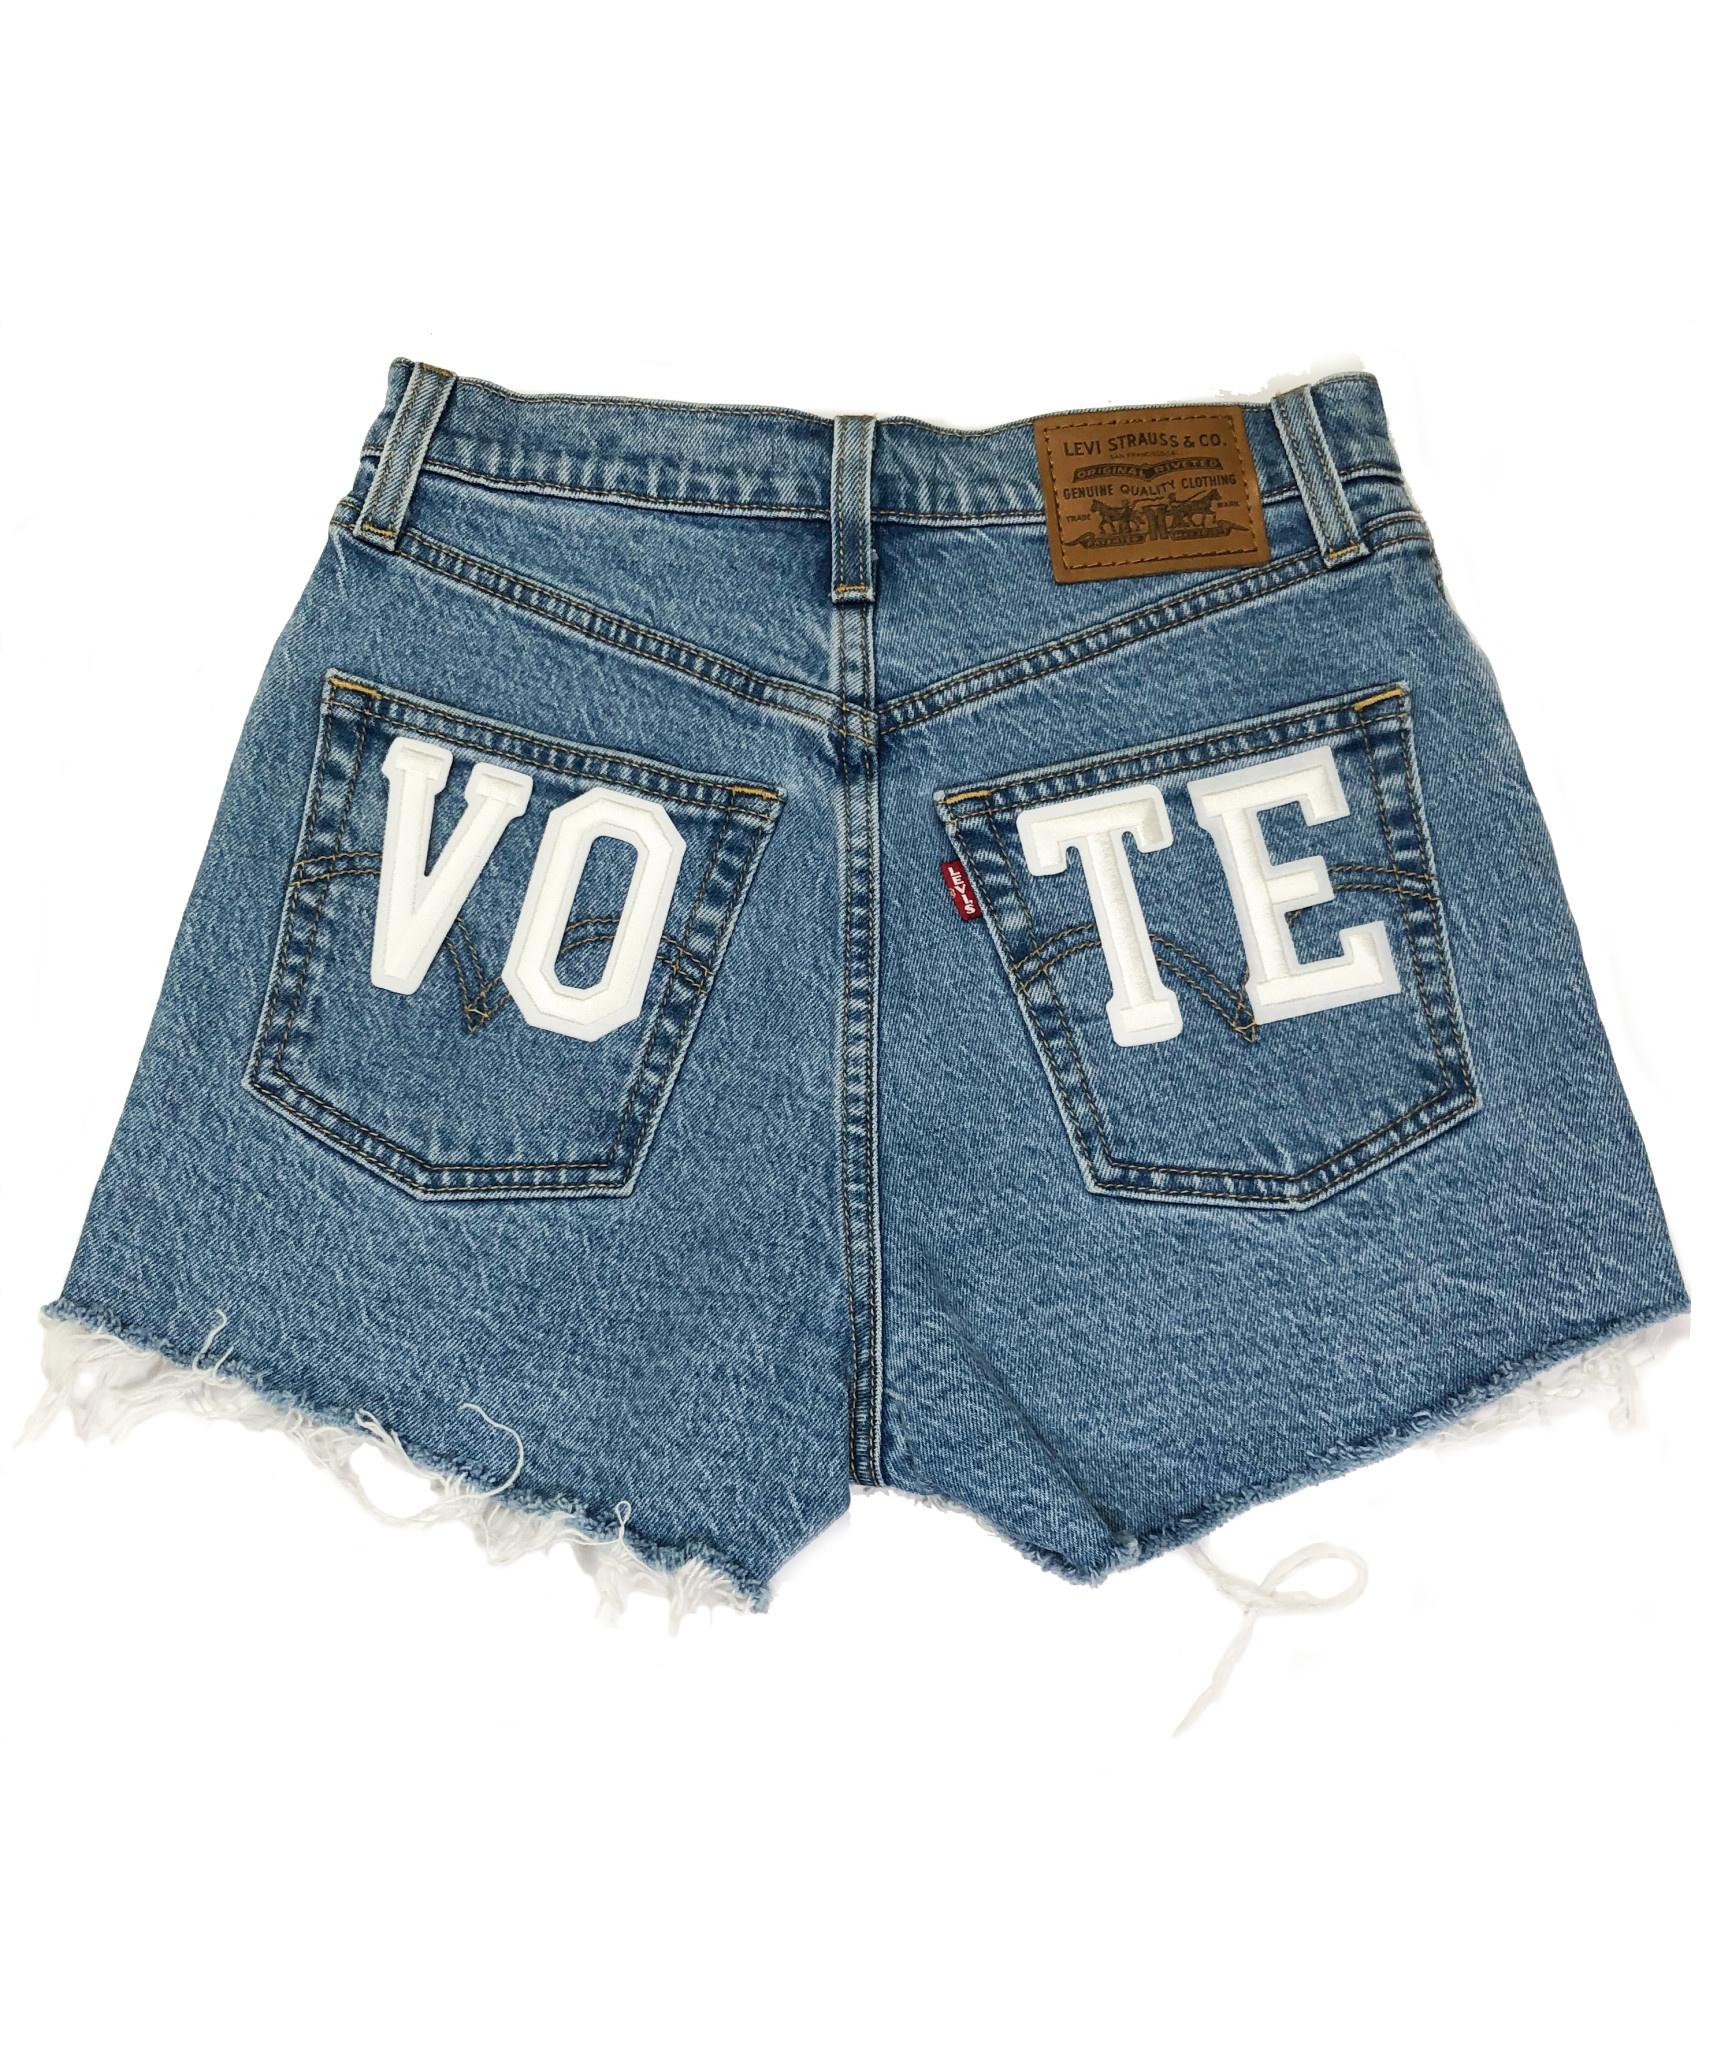 LEVI'S VOTE RIBCAGE SHORTS 77879-0005 TANGO STONEWASH-1